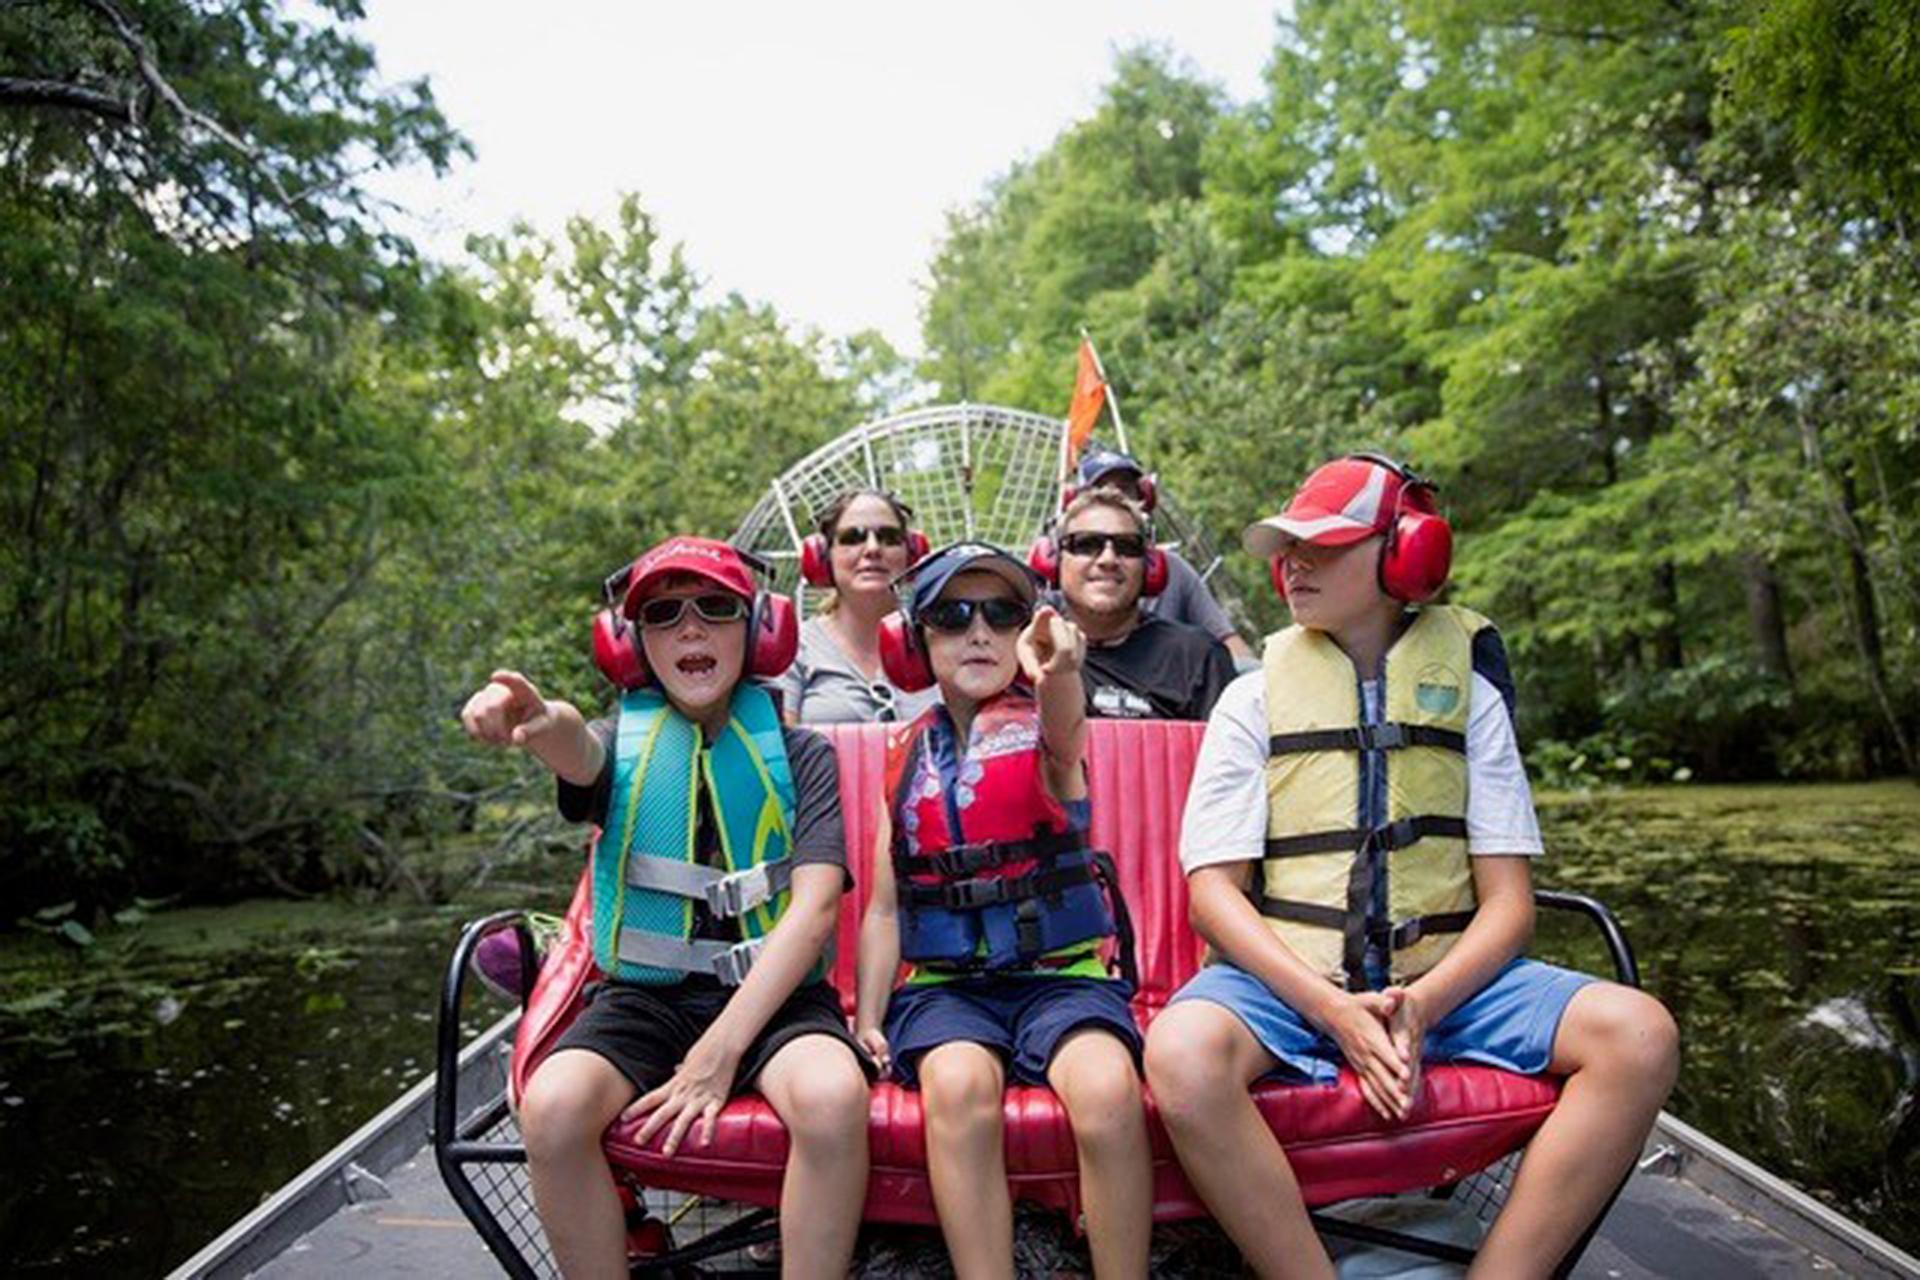 Family on Airboat Tour in Sebring, Florida; Courtesy of Visit Sebring